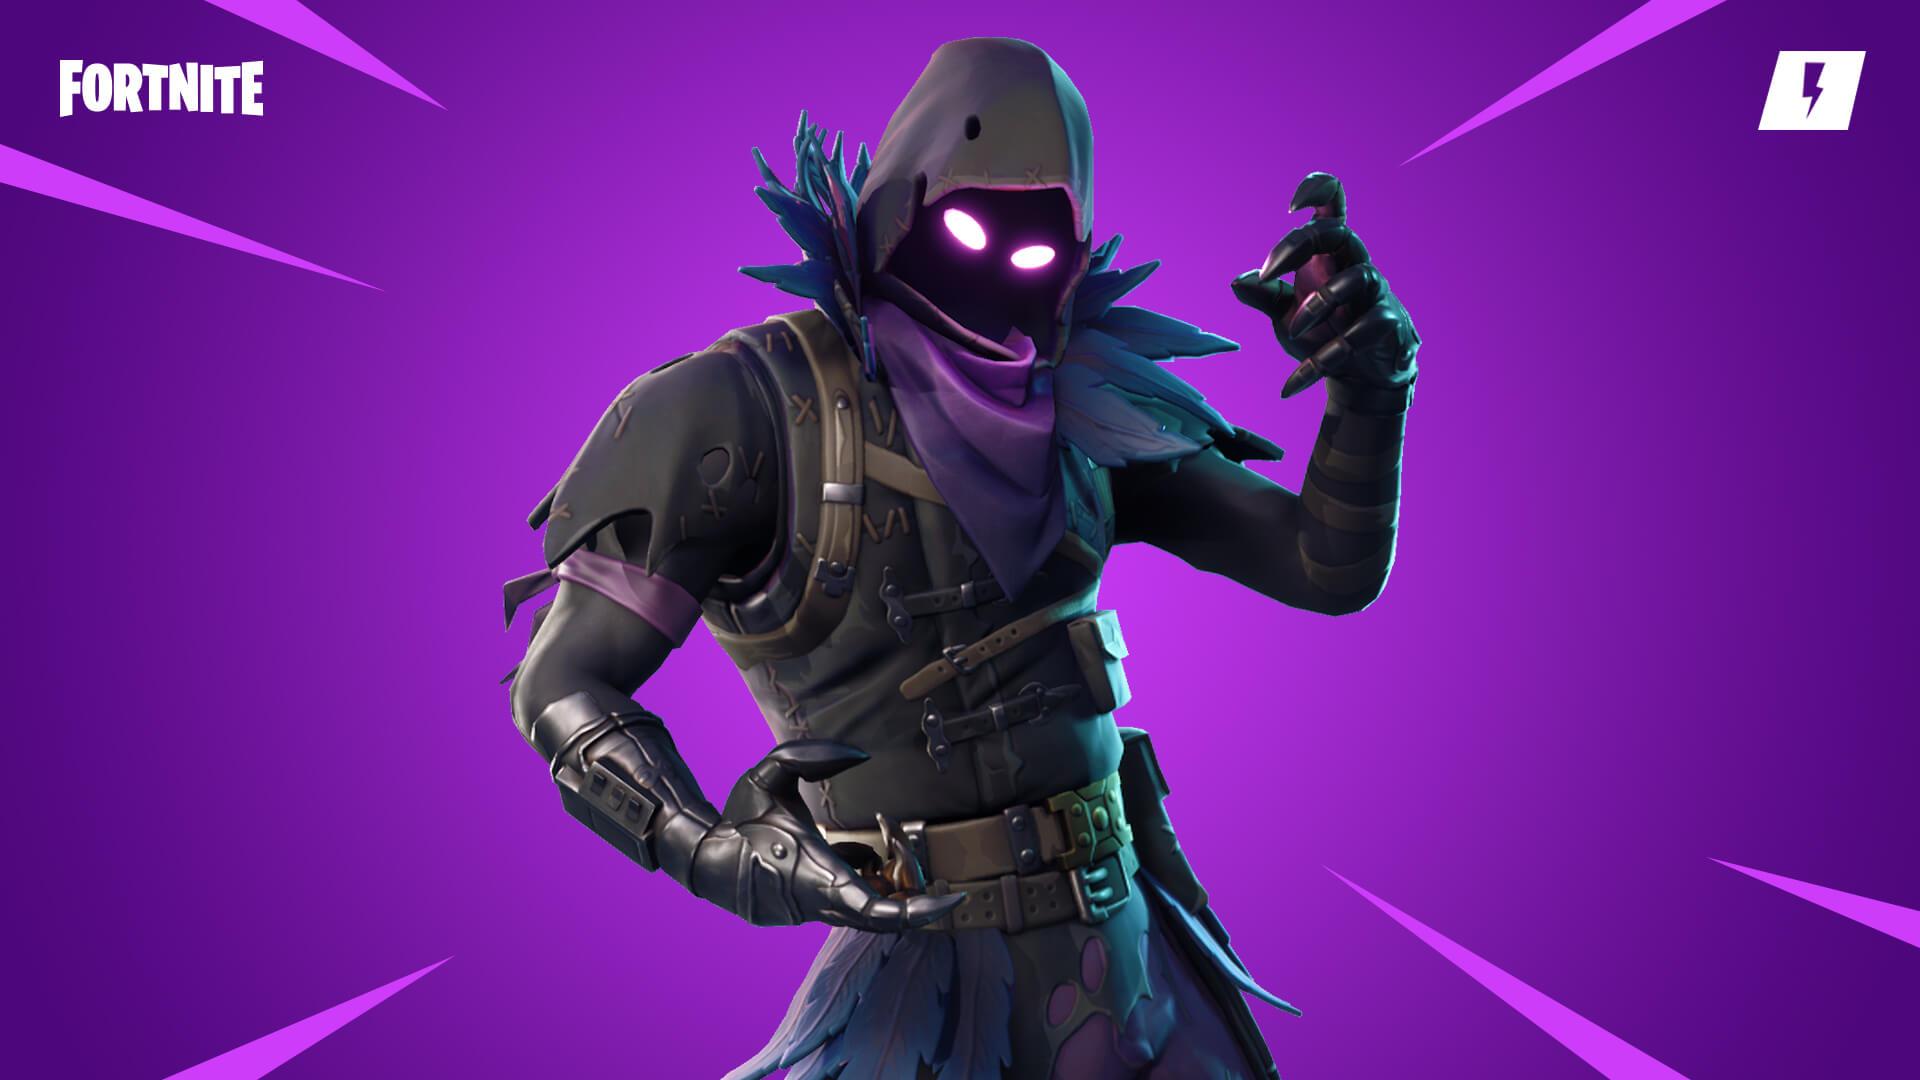 Fortnite Save The World Raven